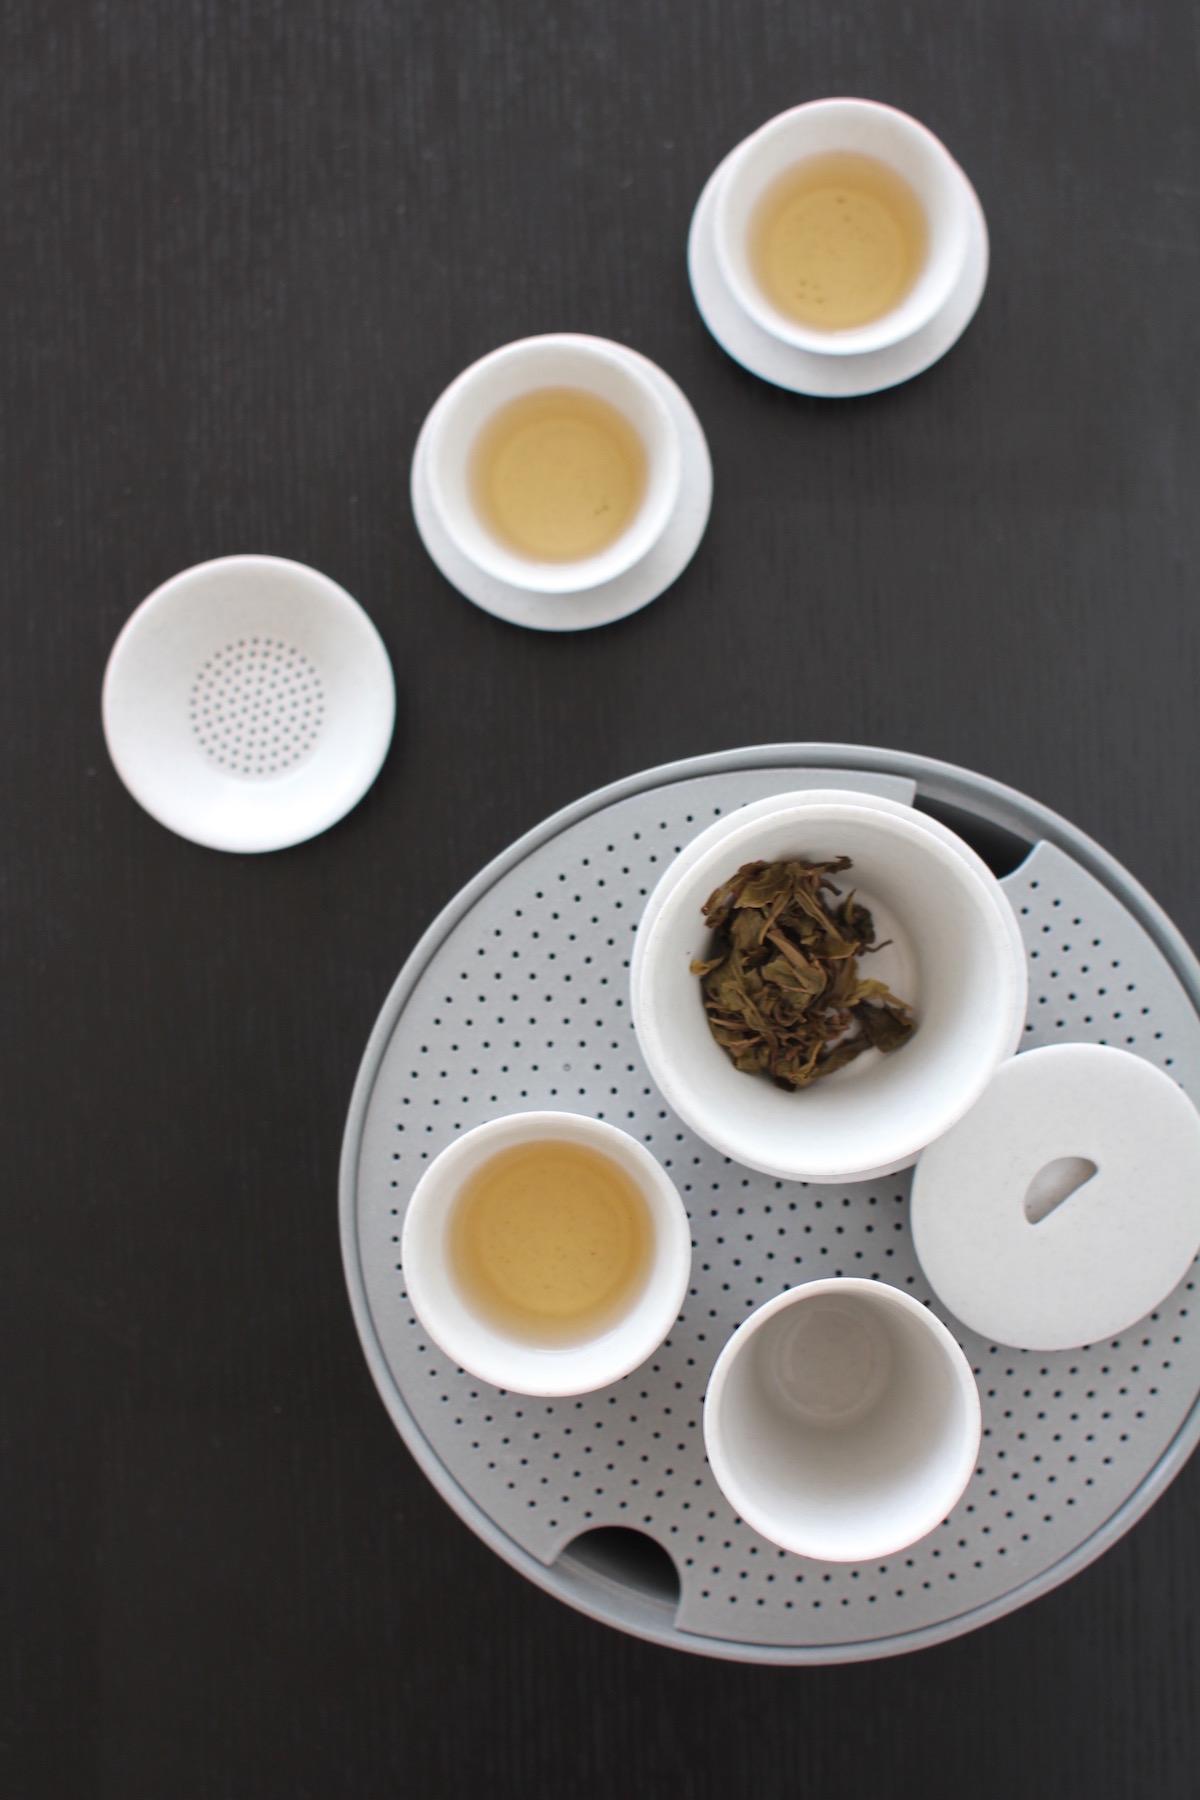 chinese tea set1.jpg